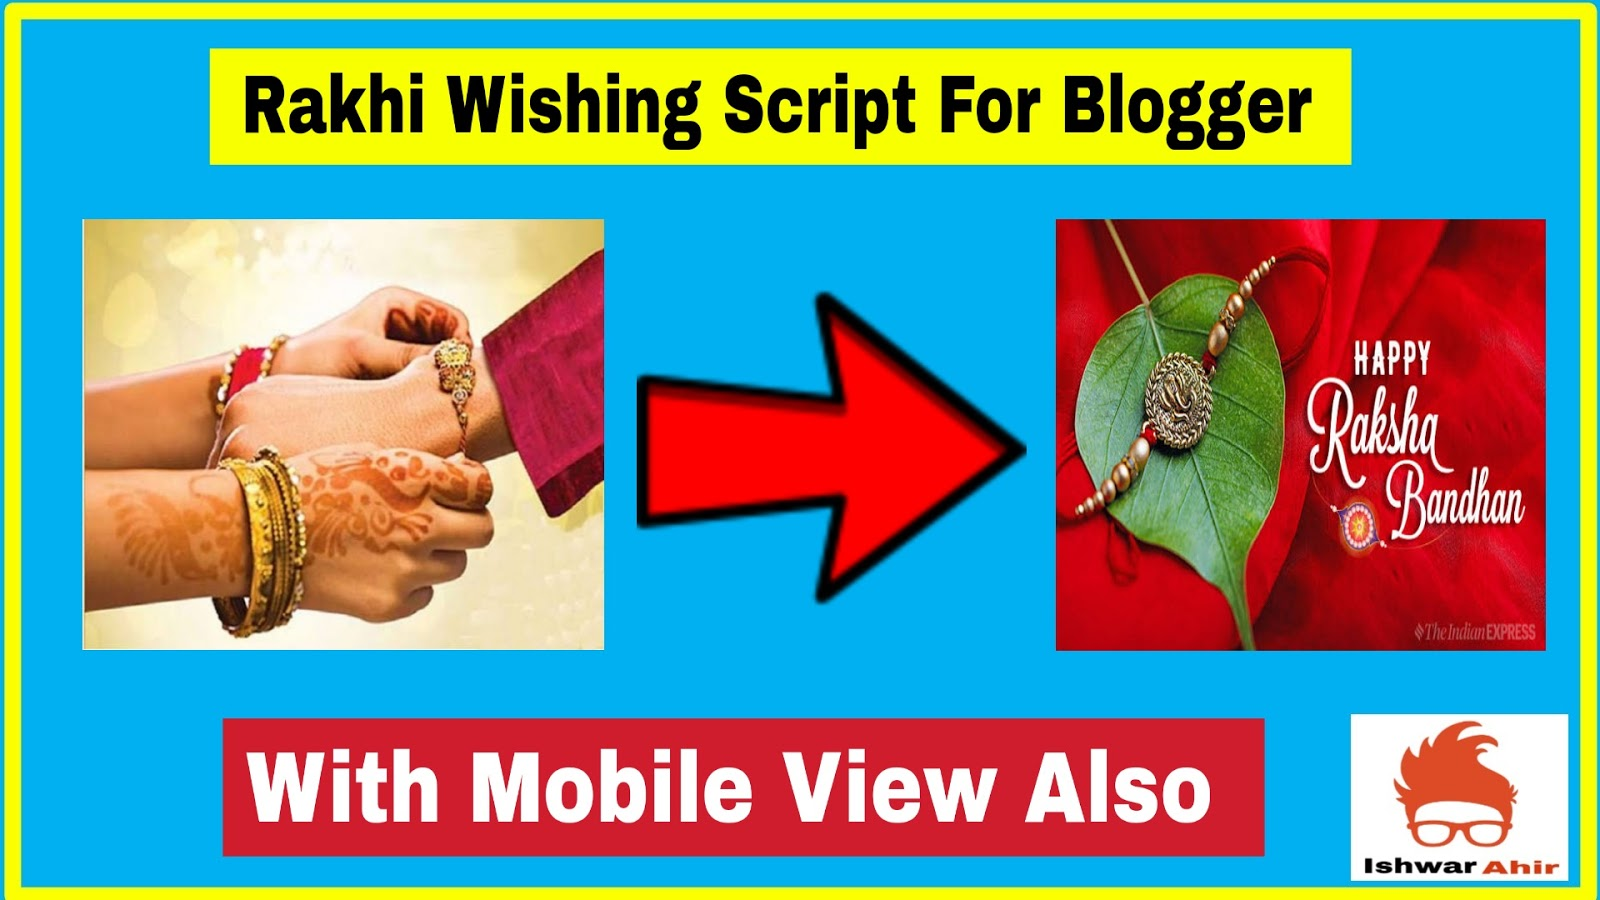 Raksha Bandhan Wishing Script For Blogger